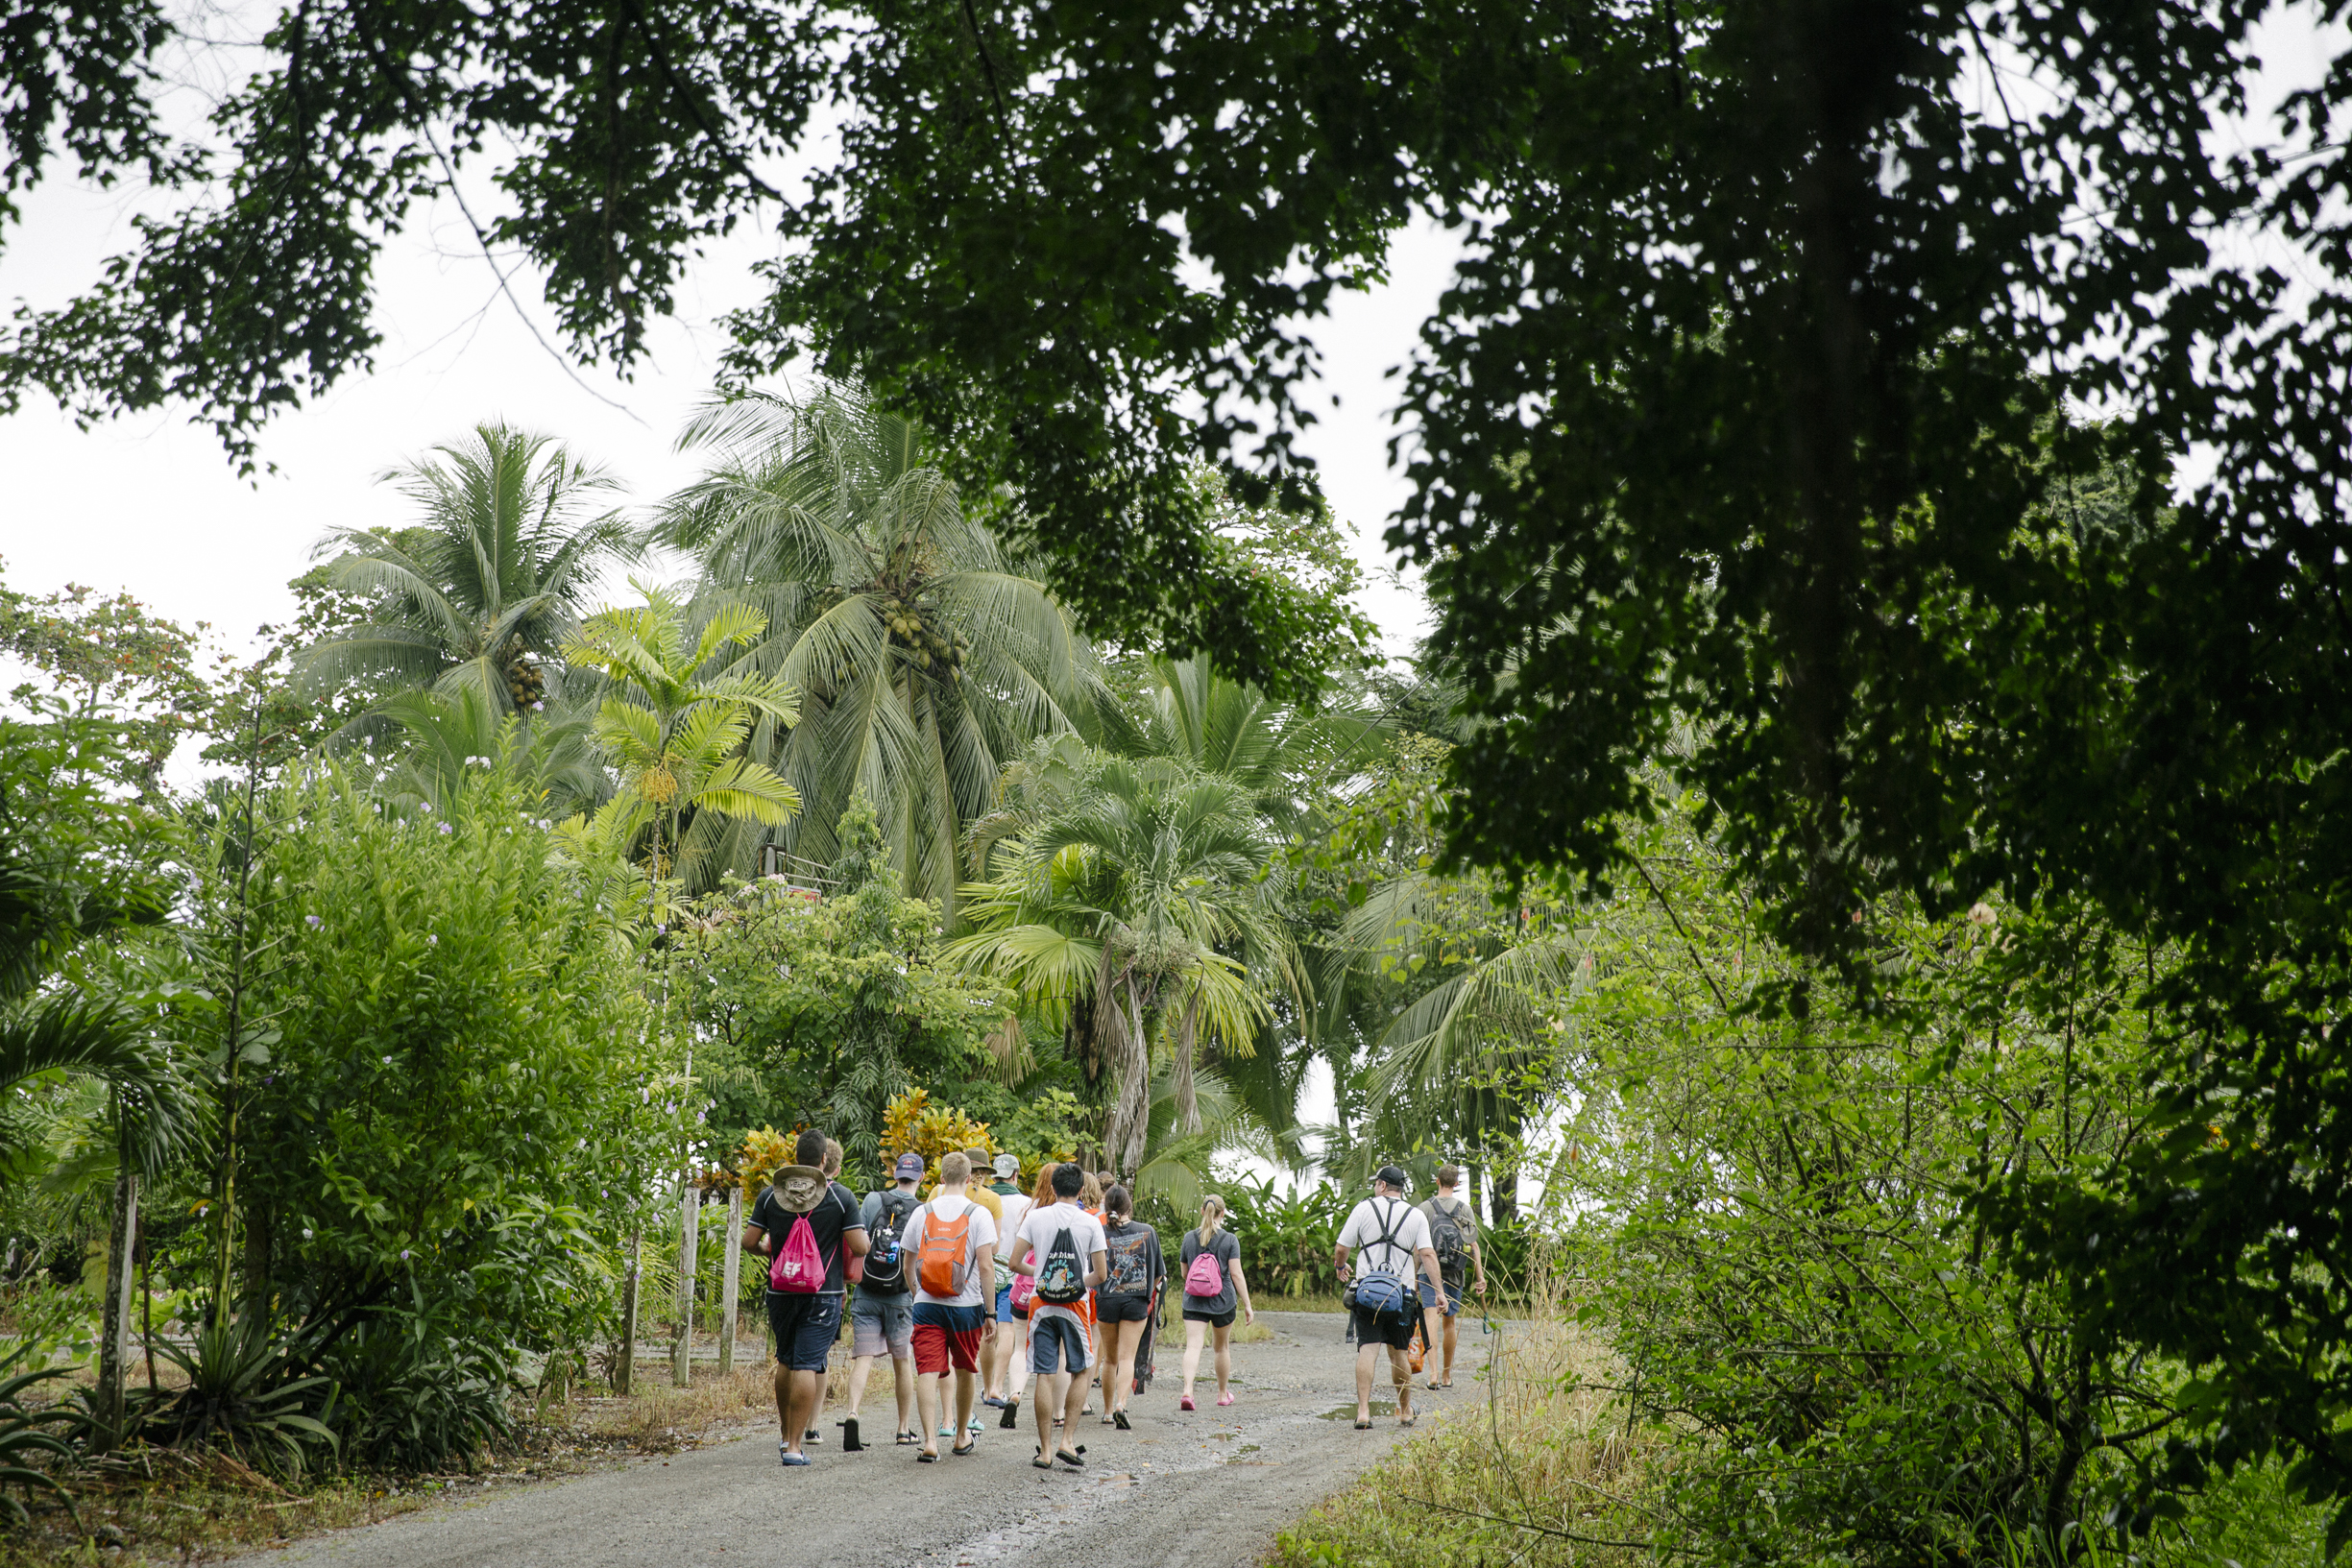 EF Gap Year: Sustainable Development in Costa Rica (July 2022)